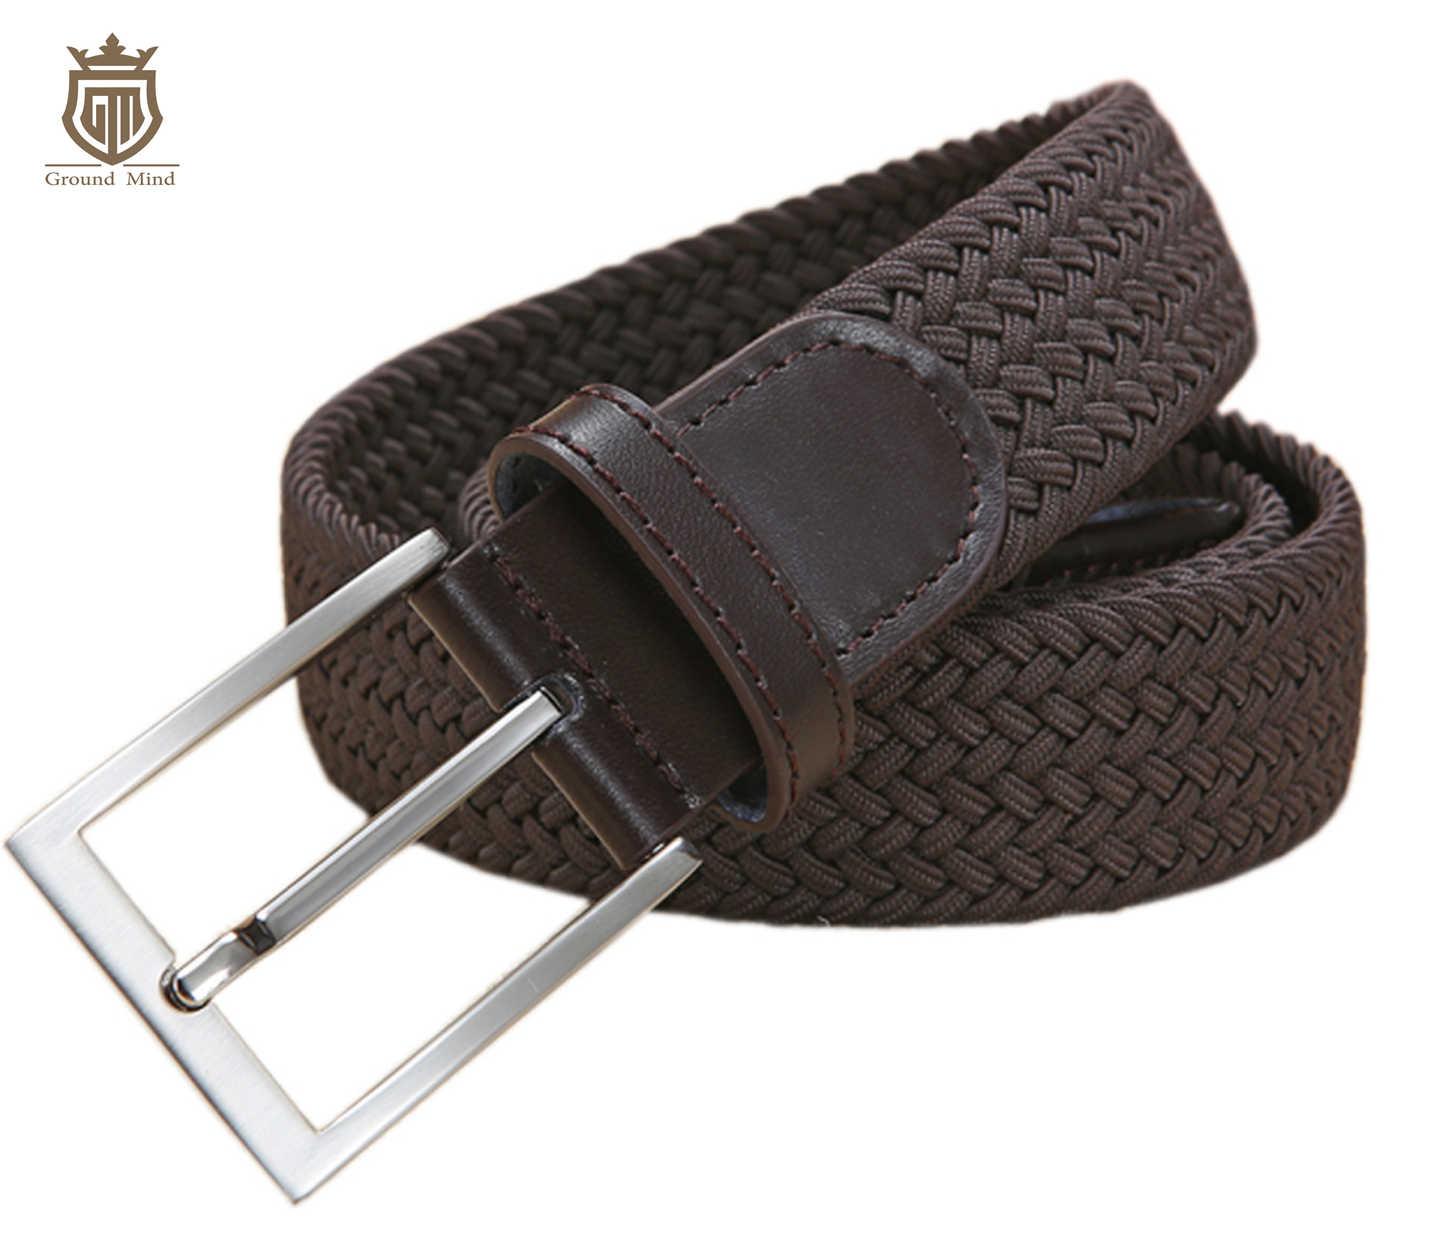 Elastic Braided Belt Stretch Woven Metal Pin Buckle for Men Women Jeans Black